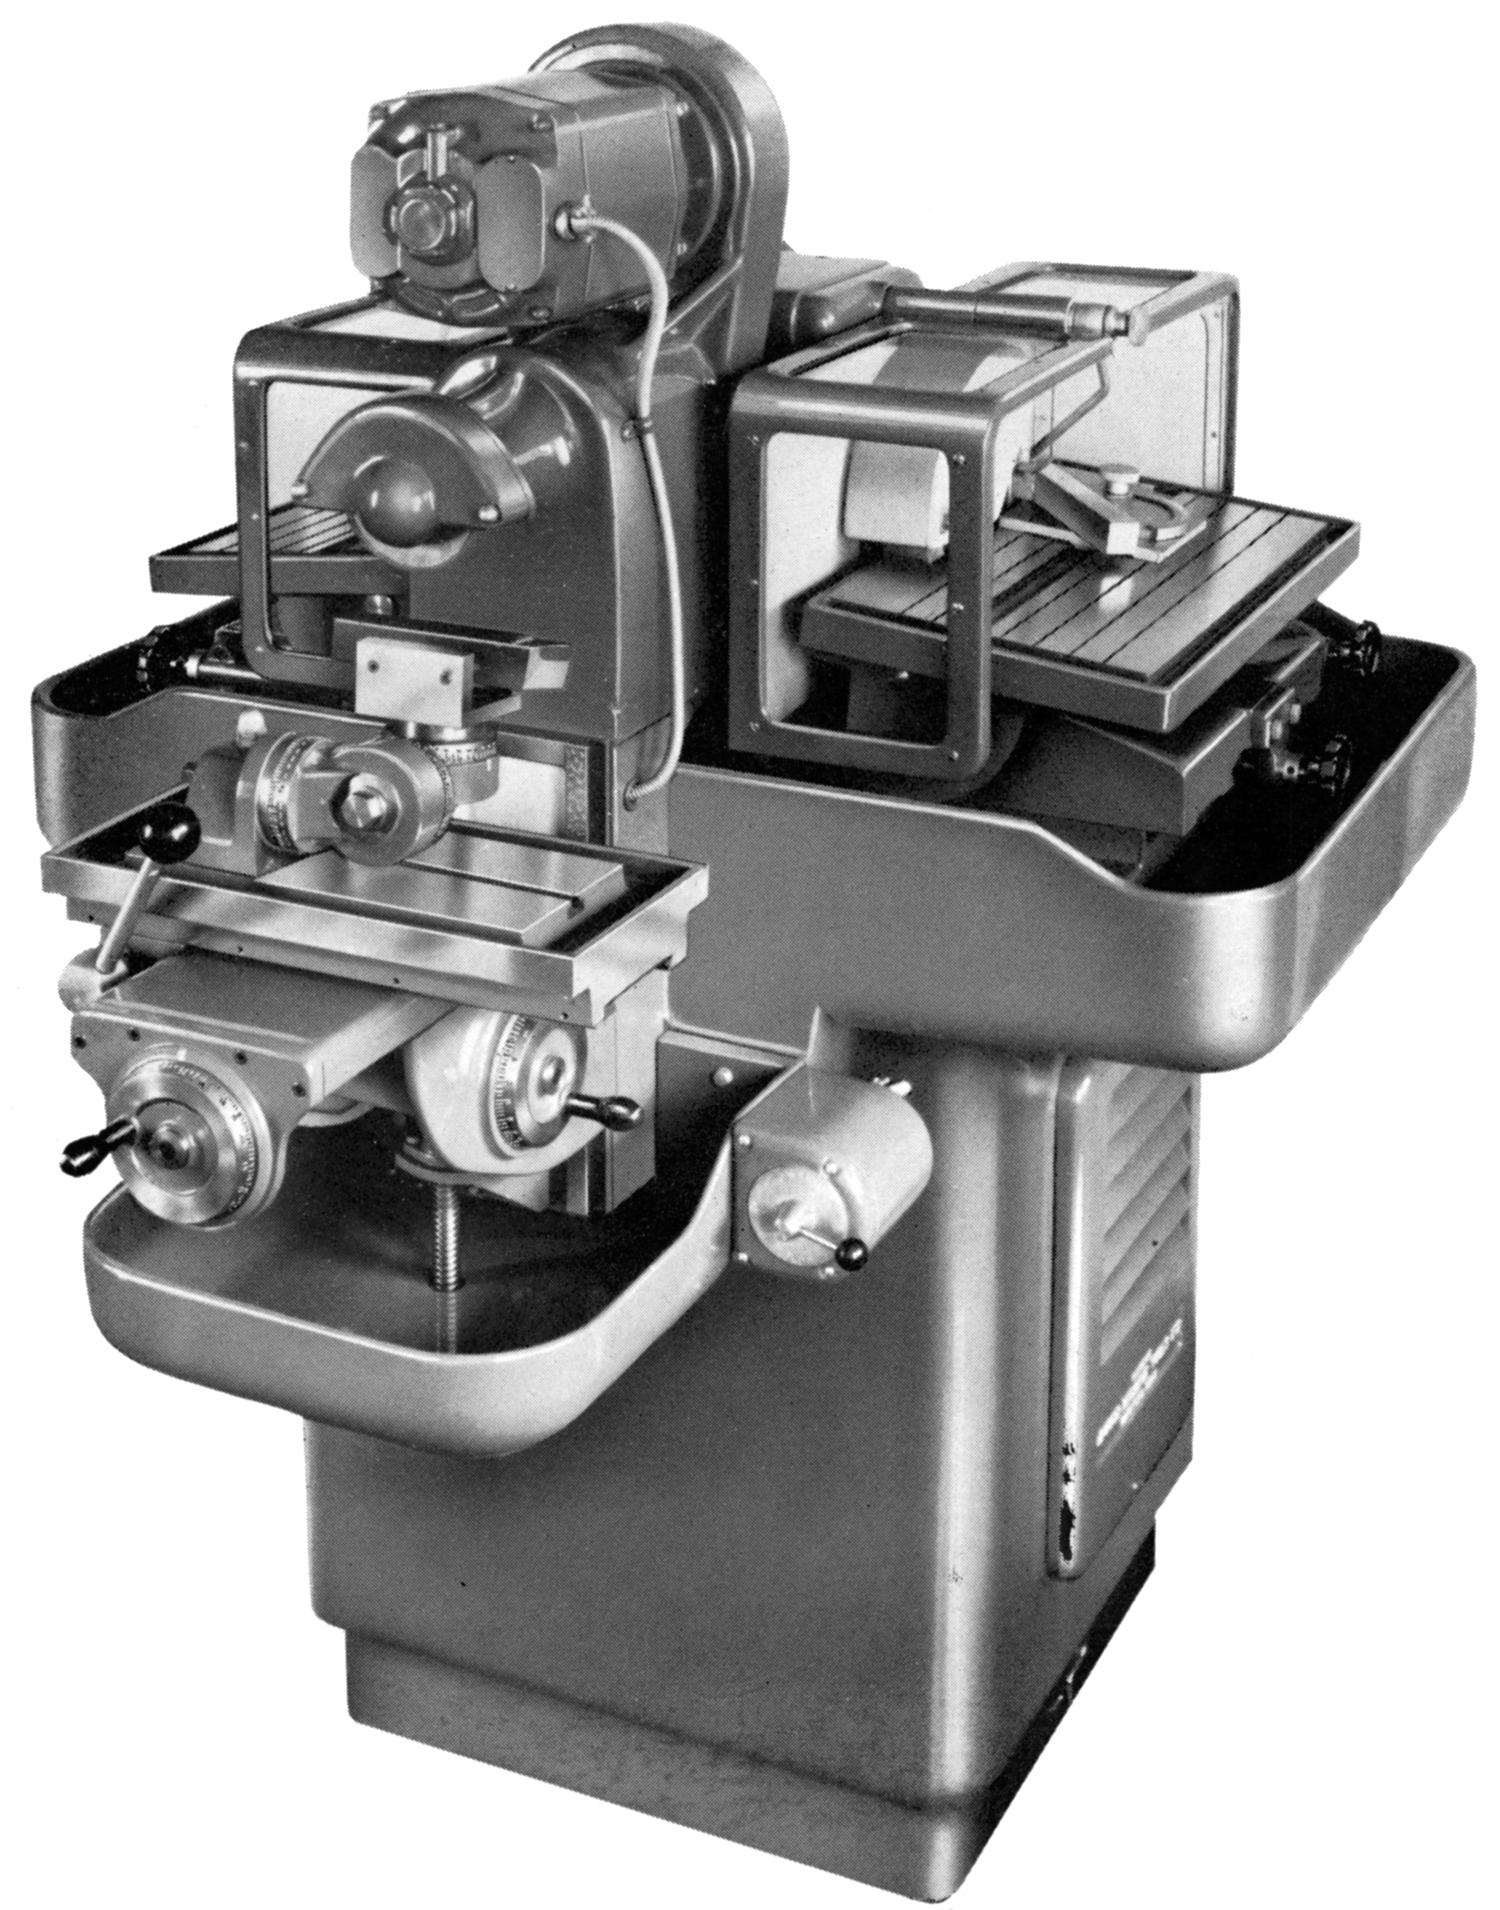 Abwood Carbide Tool Grinder